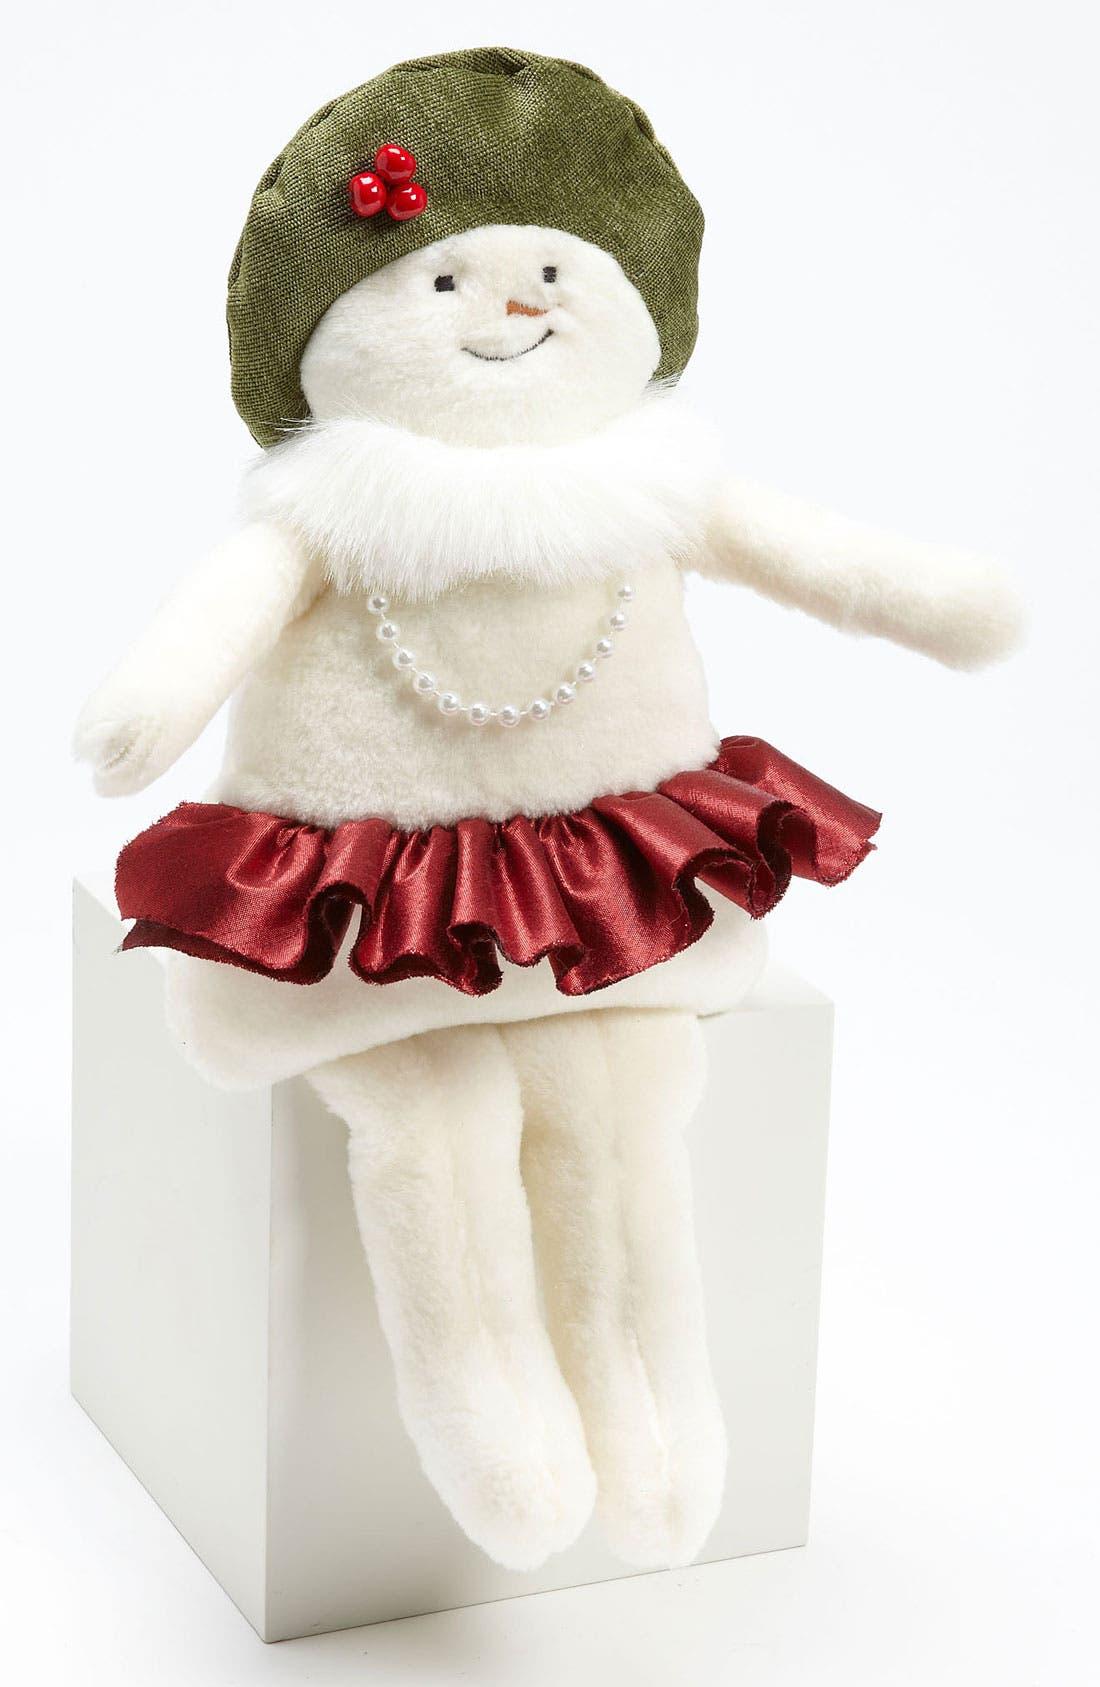 Main Image - Woof & Poof Small Snowgirl Bean Bag